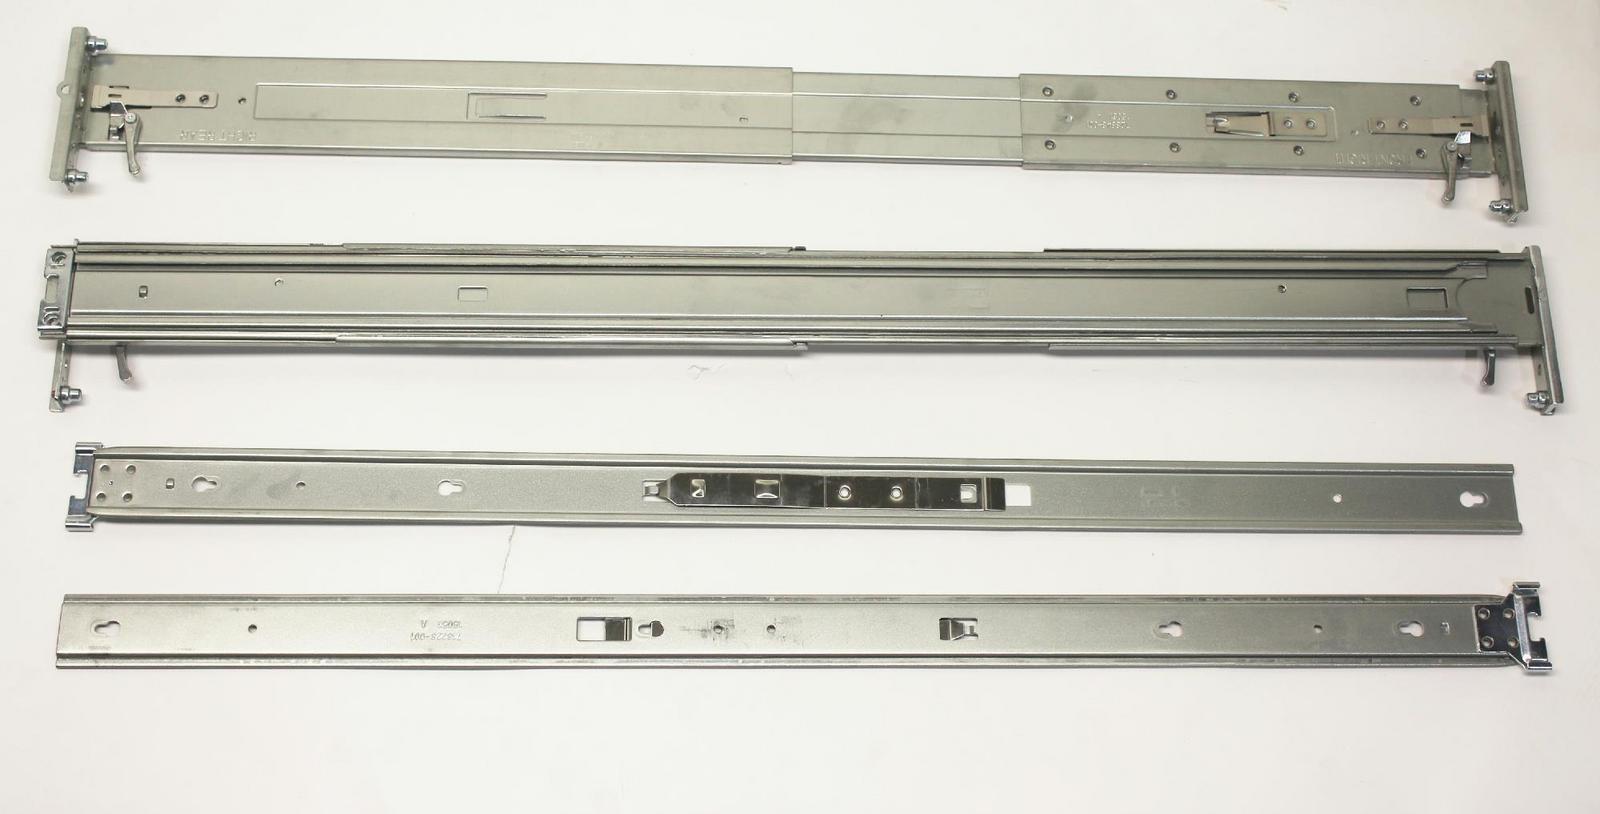 2u small form factor easy install rail kit (733660-b21)